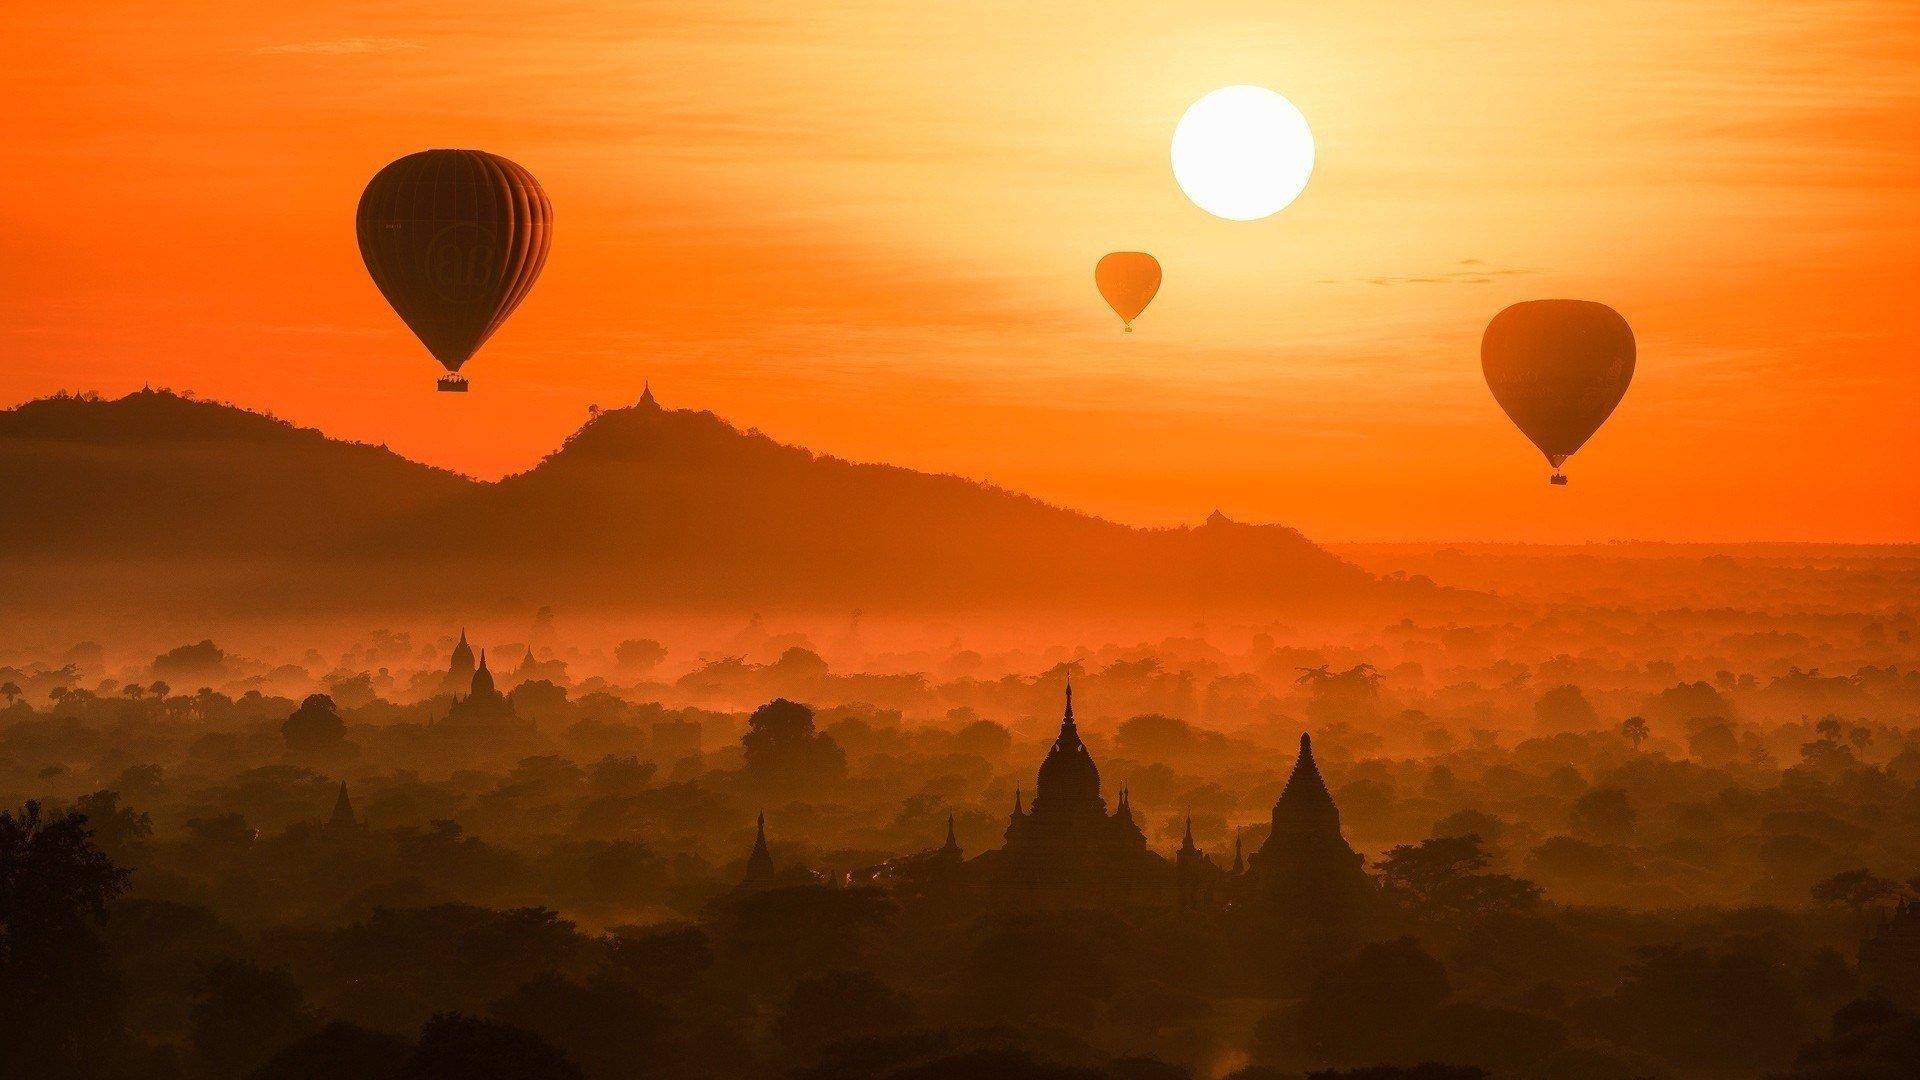 Vehicles - Hot Air Balloon  Myanmar Temple Sunset Wallpaper